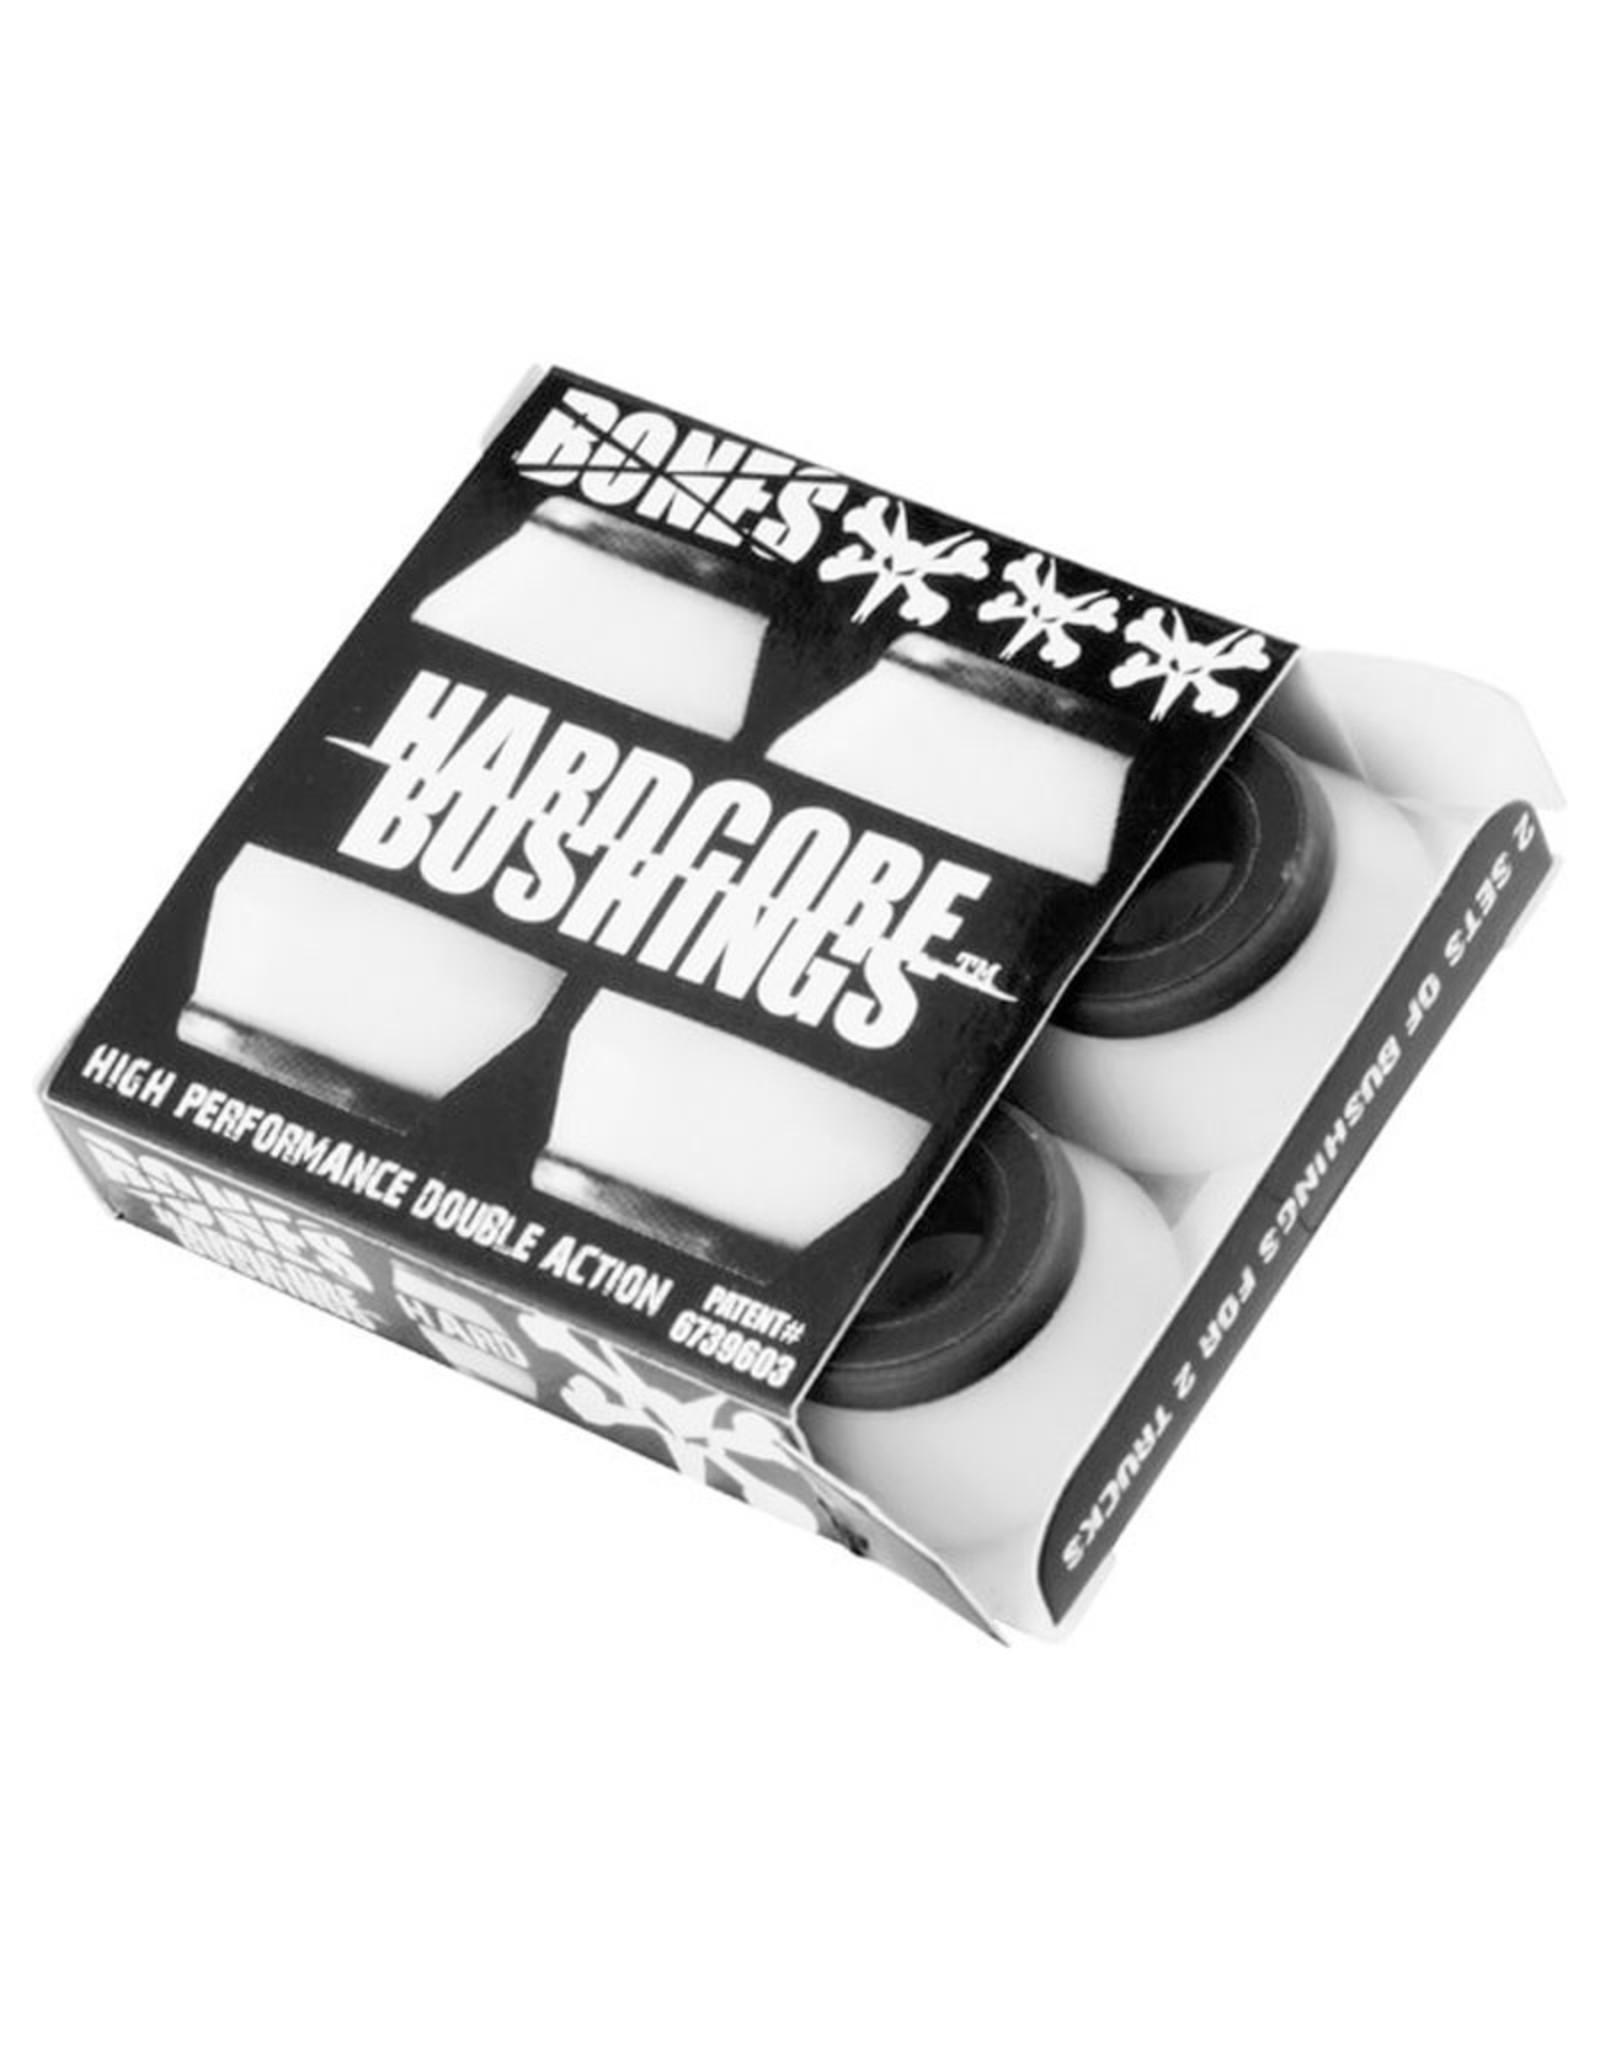 Bones Bones Bushings Hardcore Black/White (Hard)